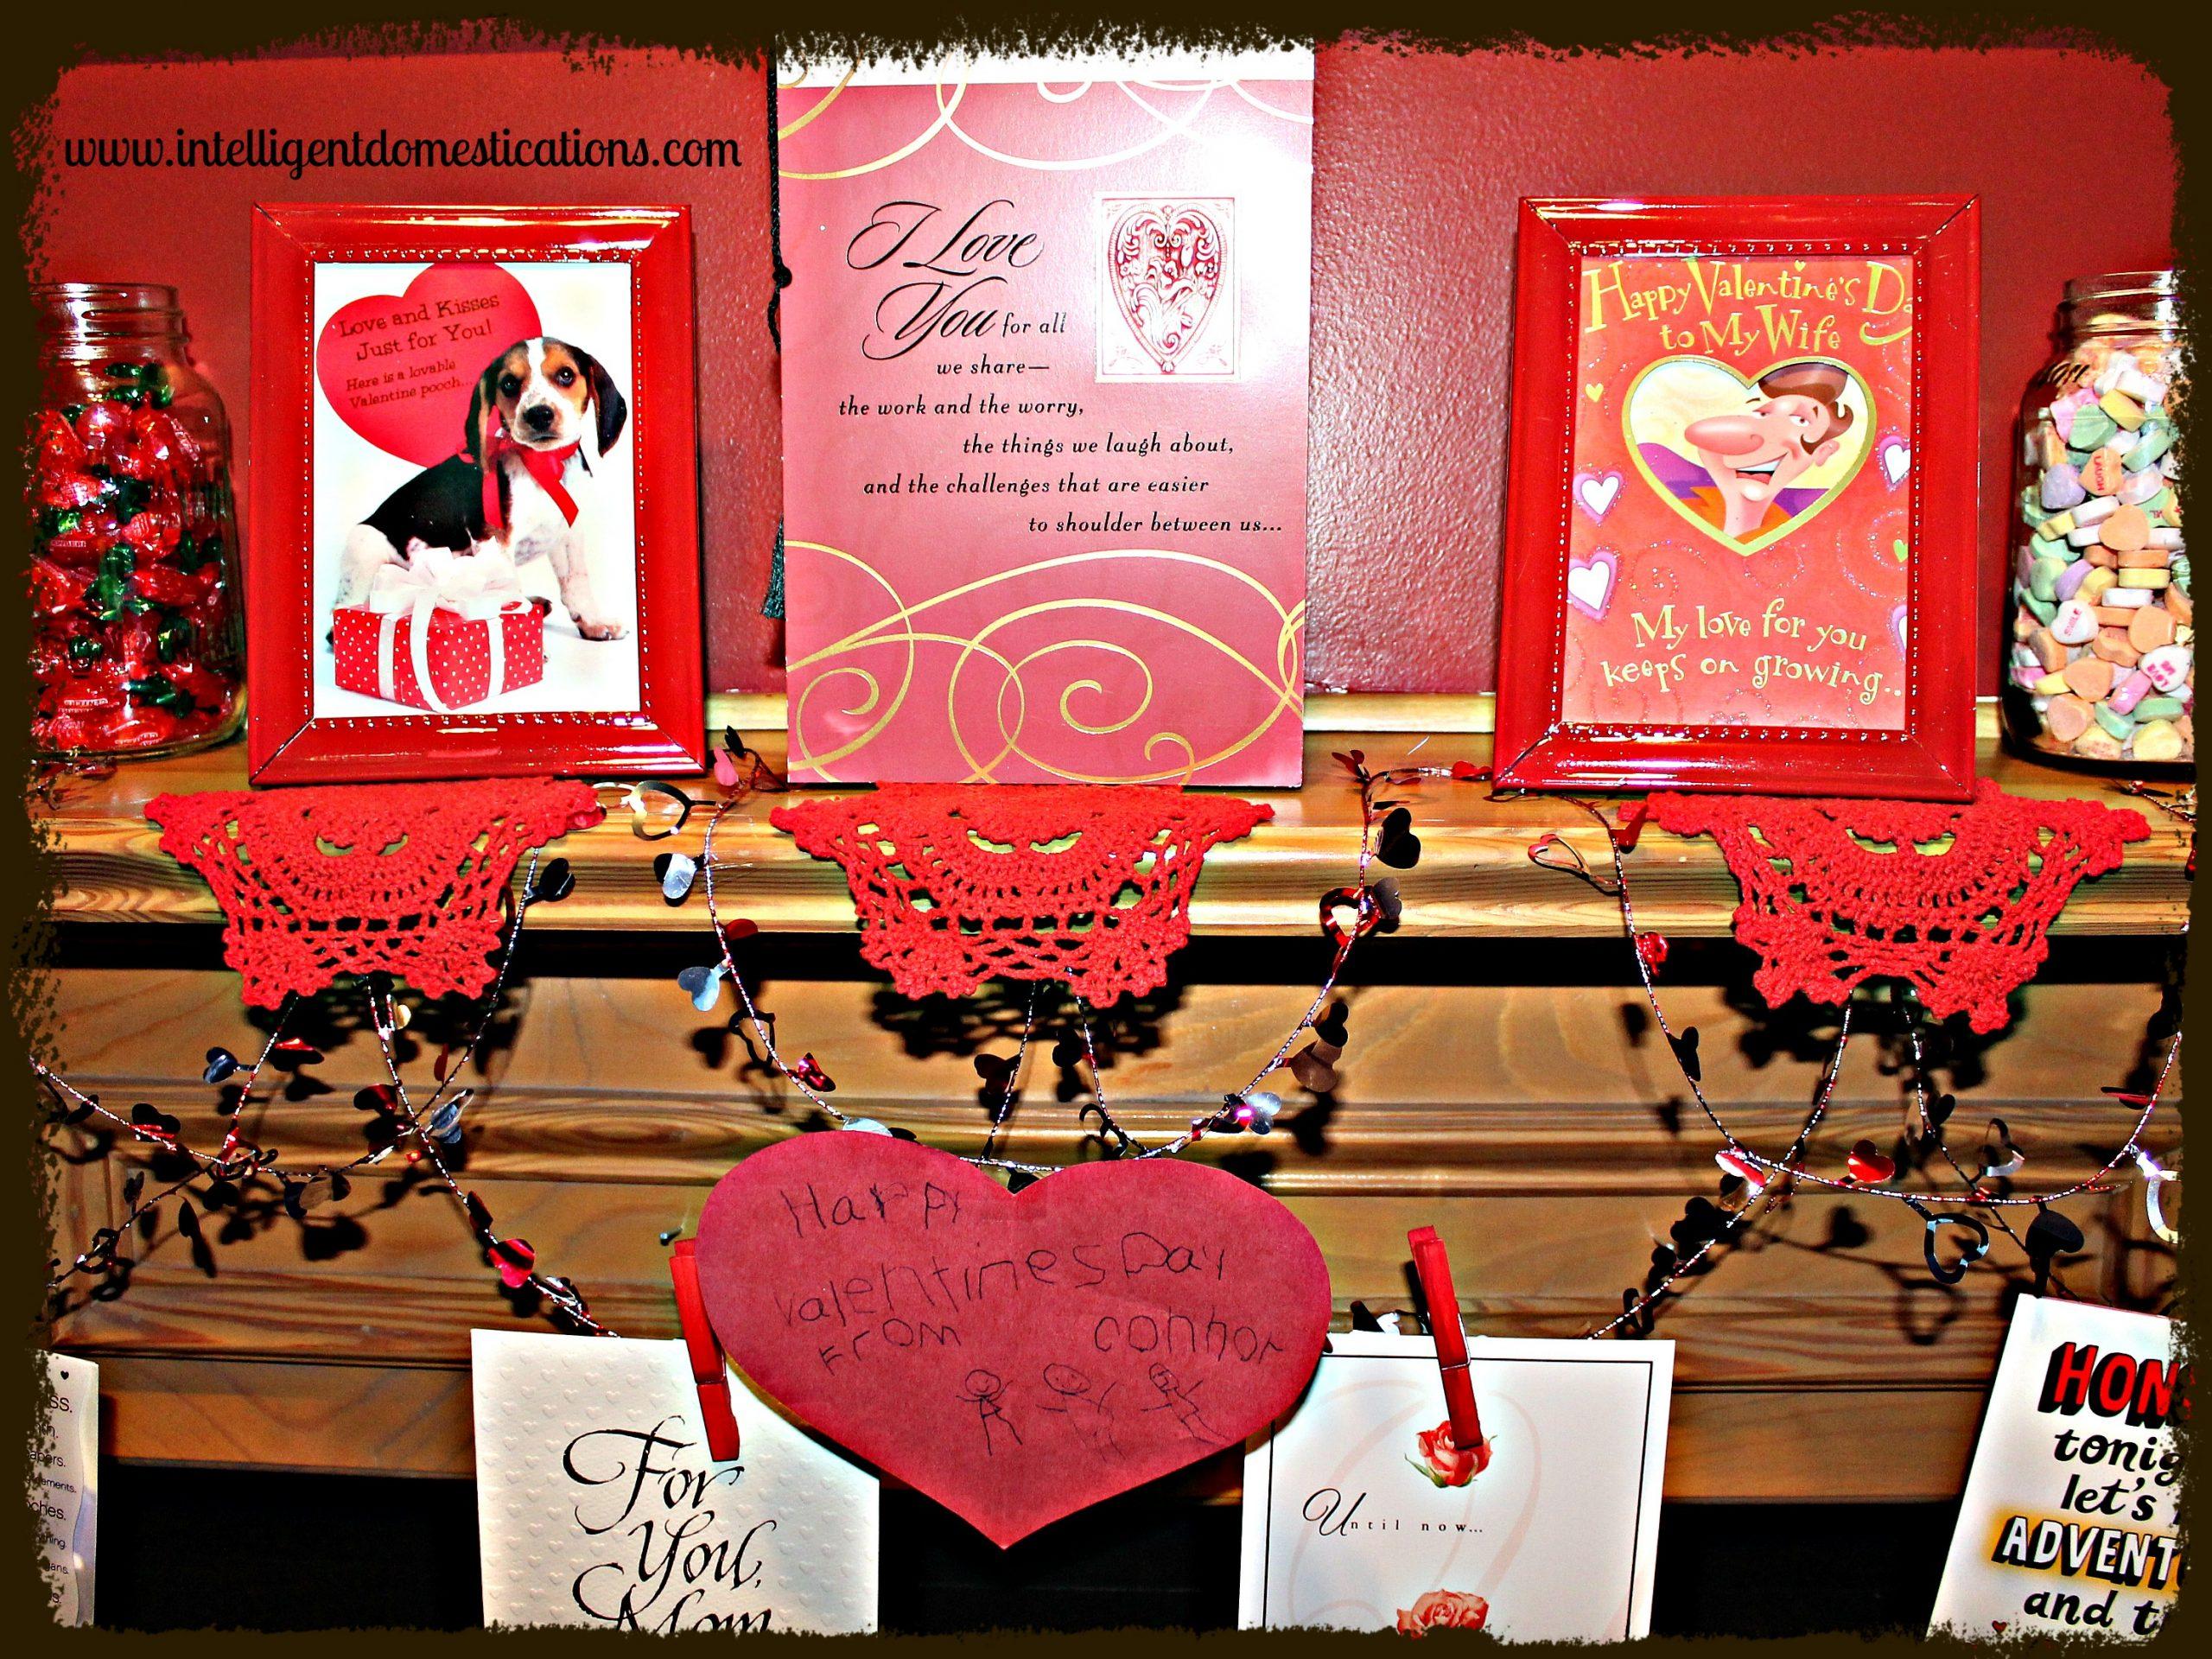 Valentine Mantlescape Close Up intelligentdomestications.com